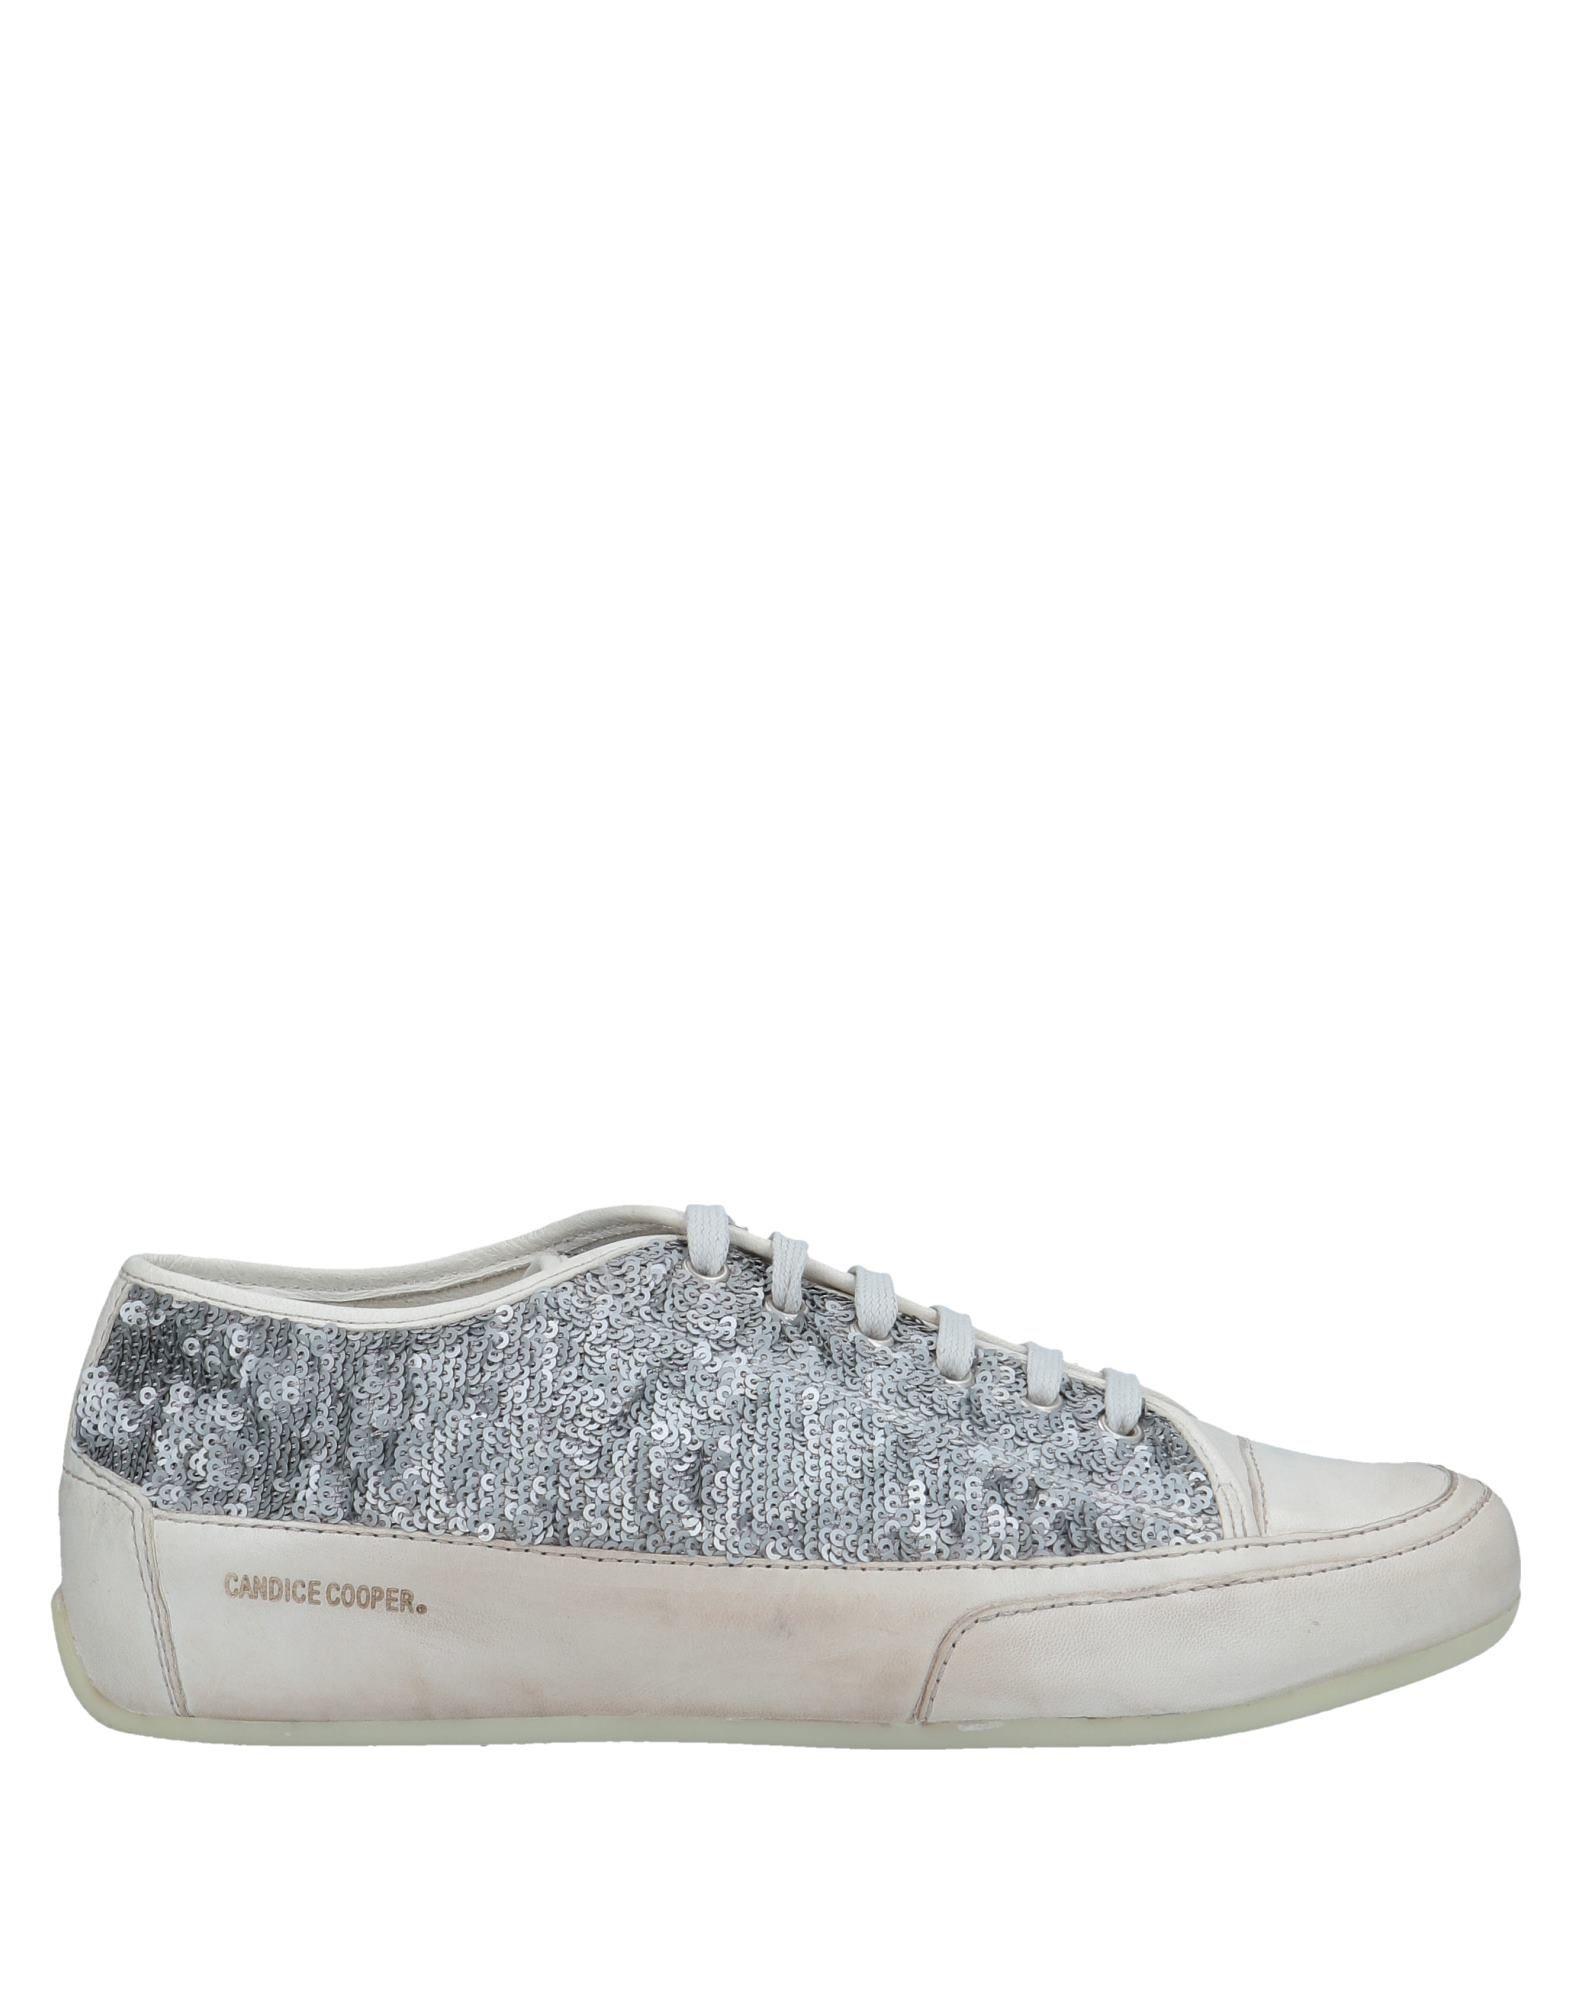 CANDICE COOPER Sneakers in Grey